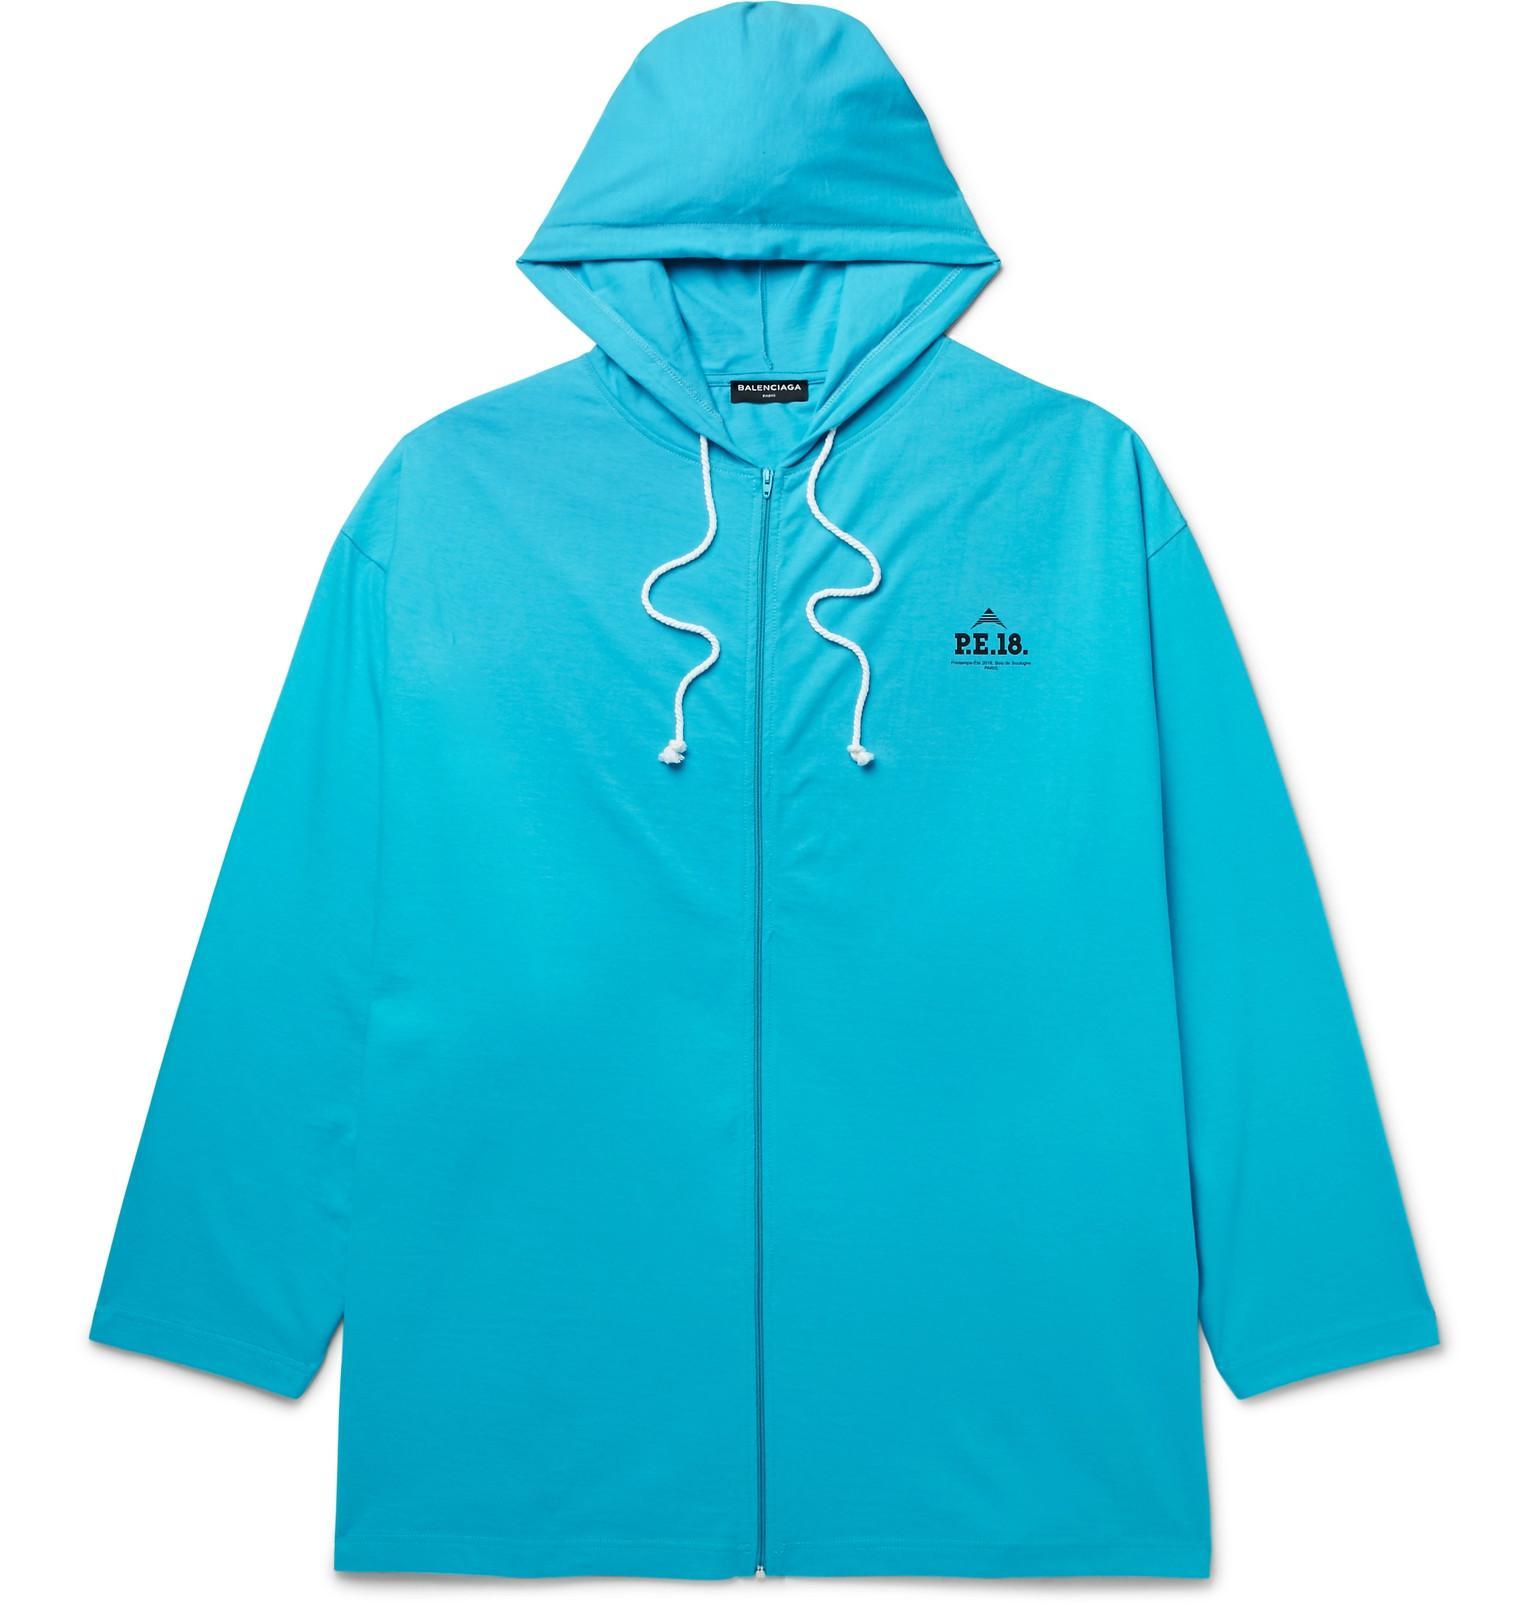 Oversized Cotton-jersey Zip-up Hoodie Balenciaga Eastbay Sale Online xDu9V8ahB